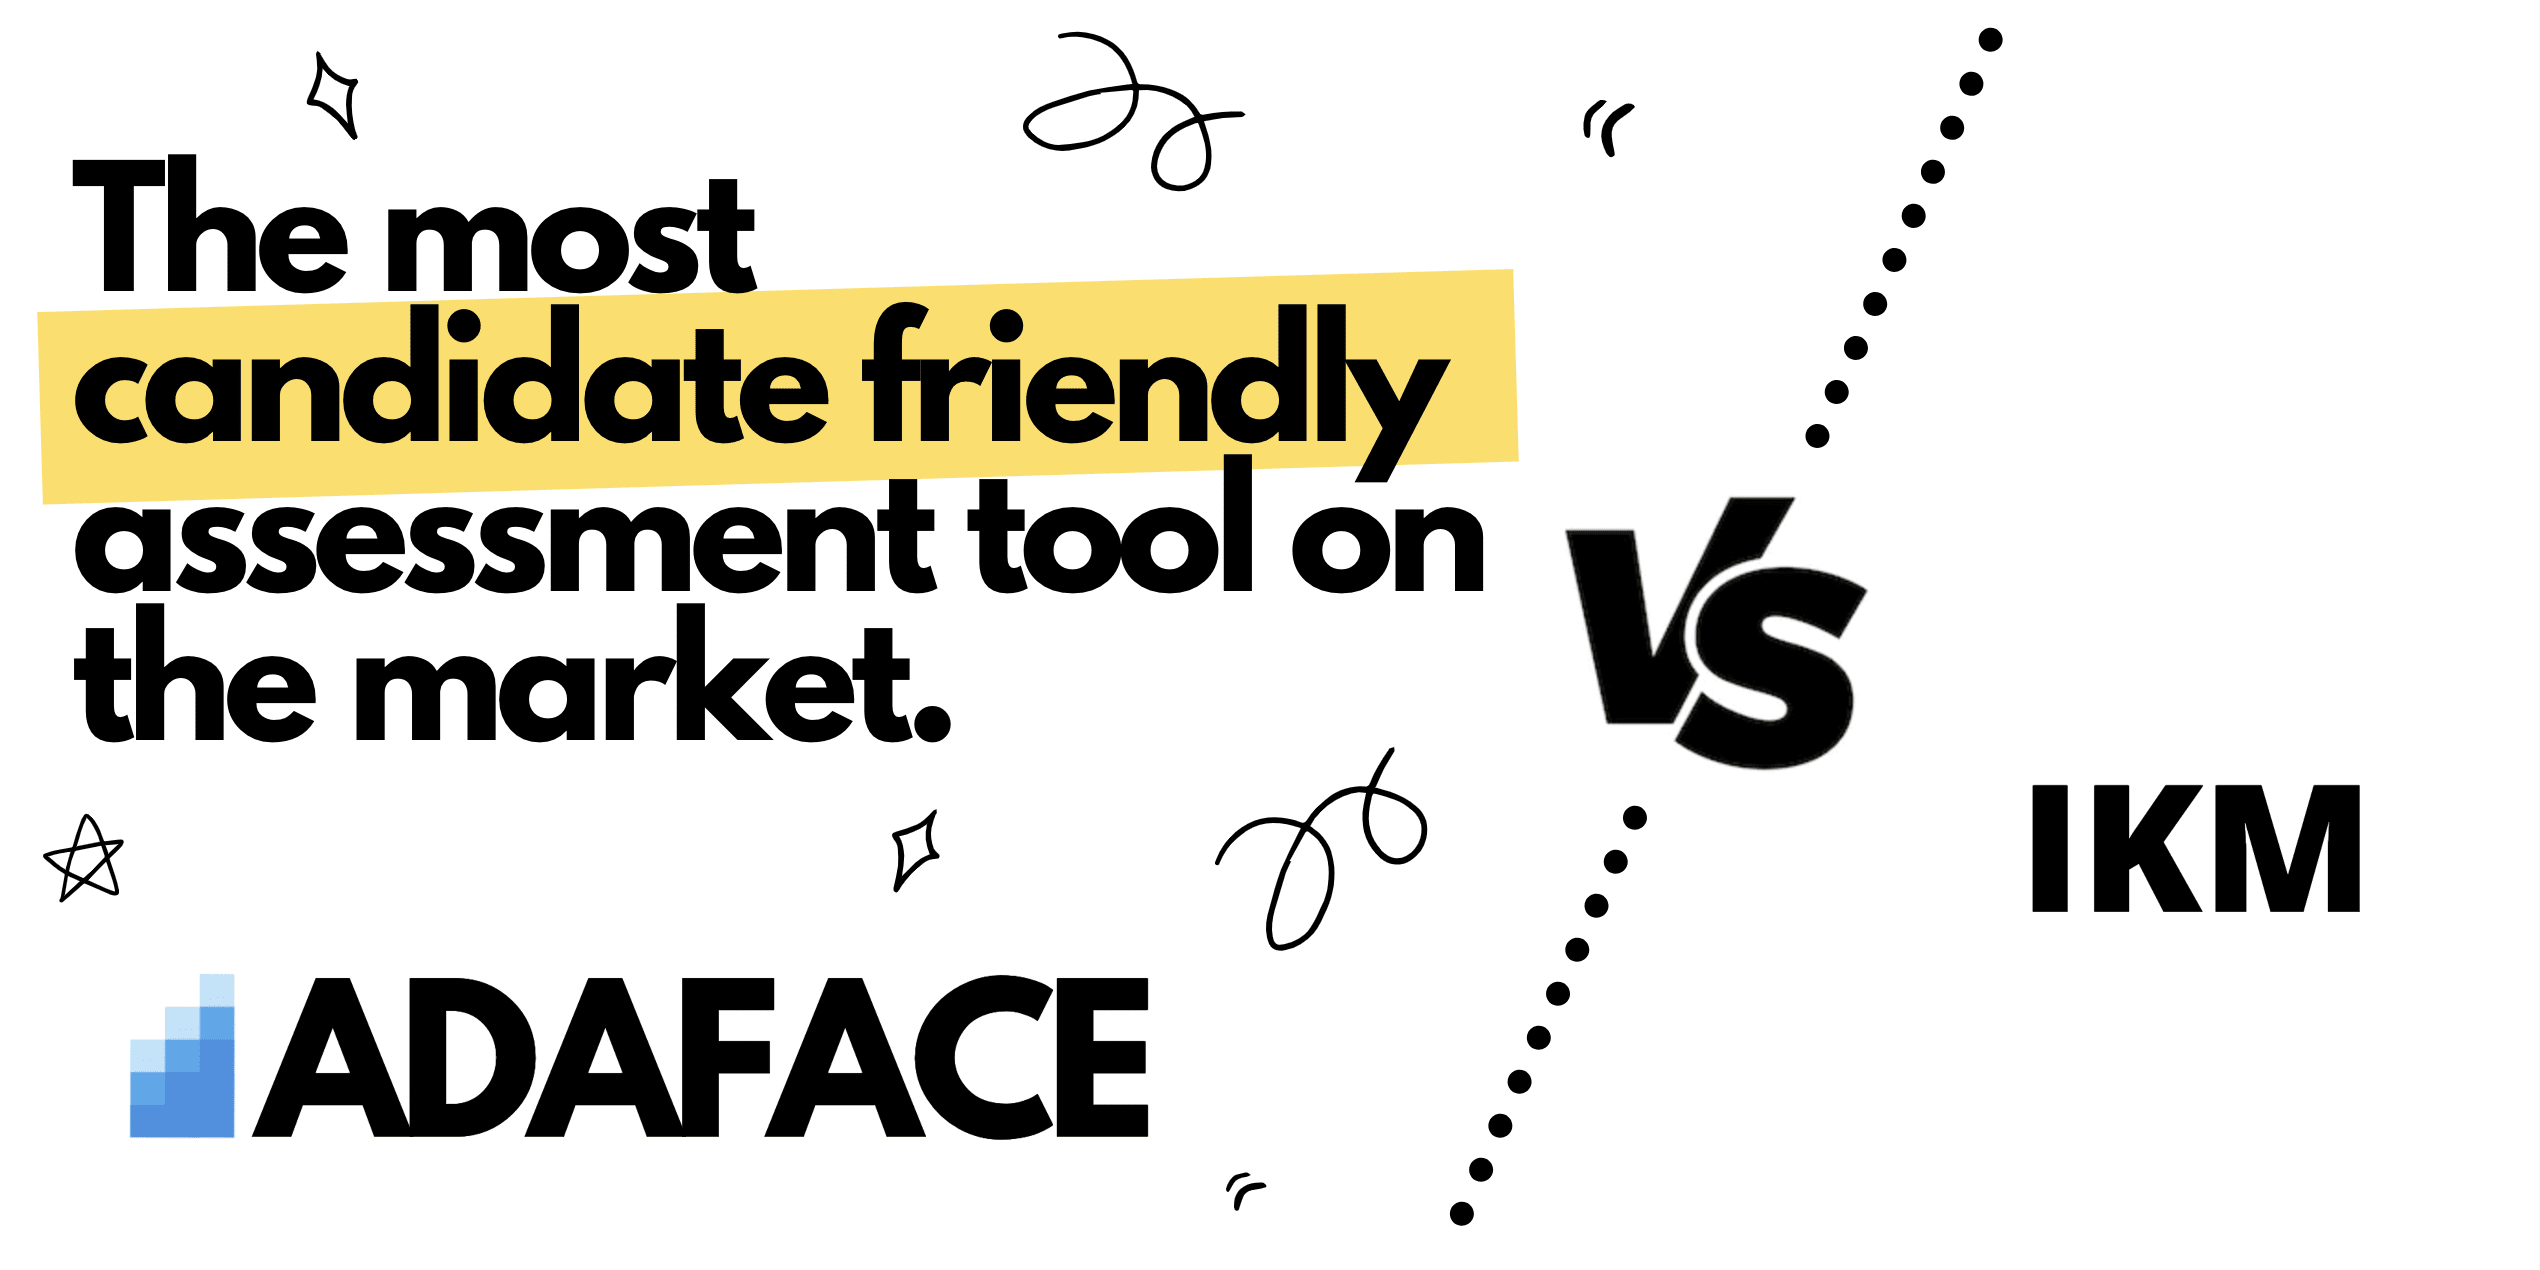 IKM vs Adaface